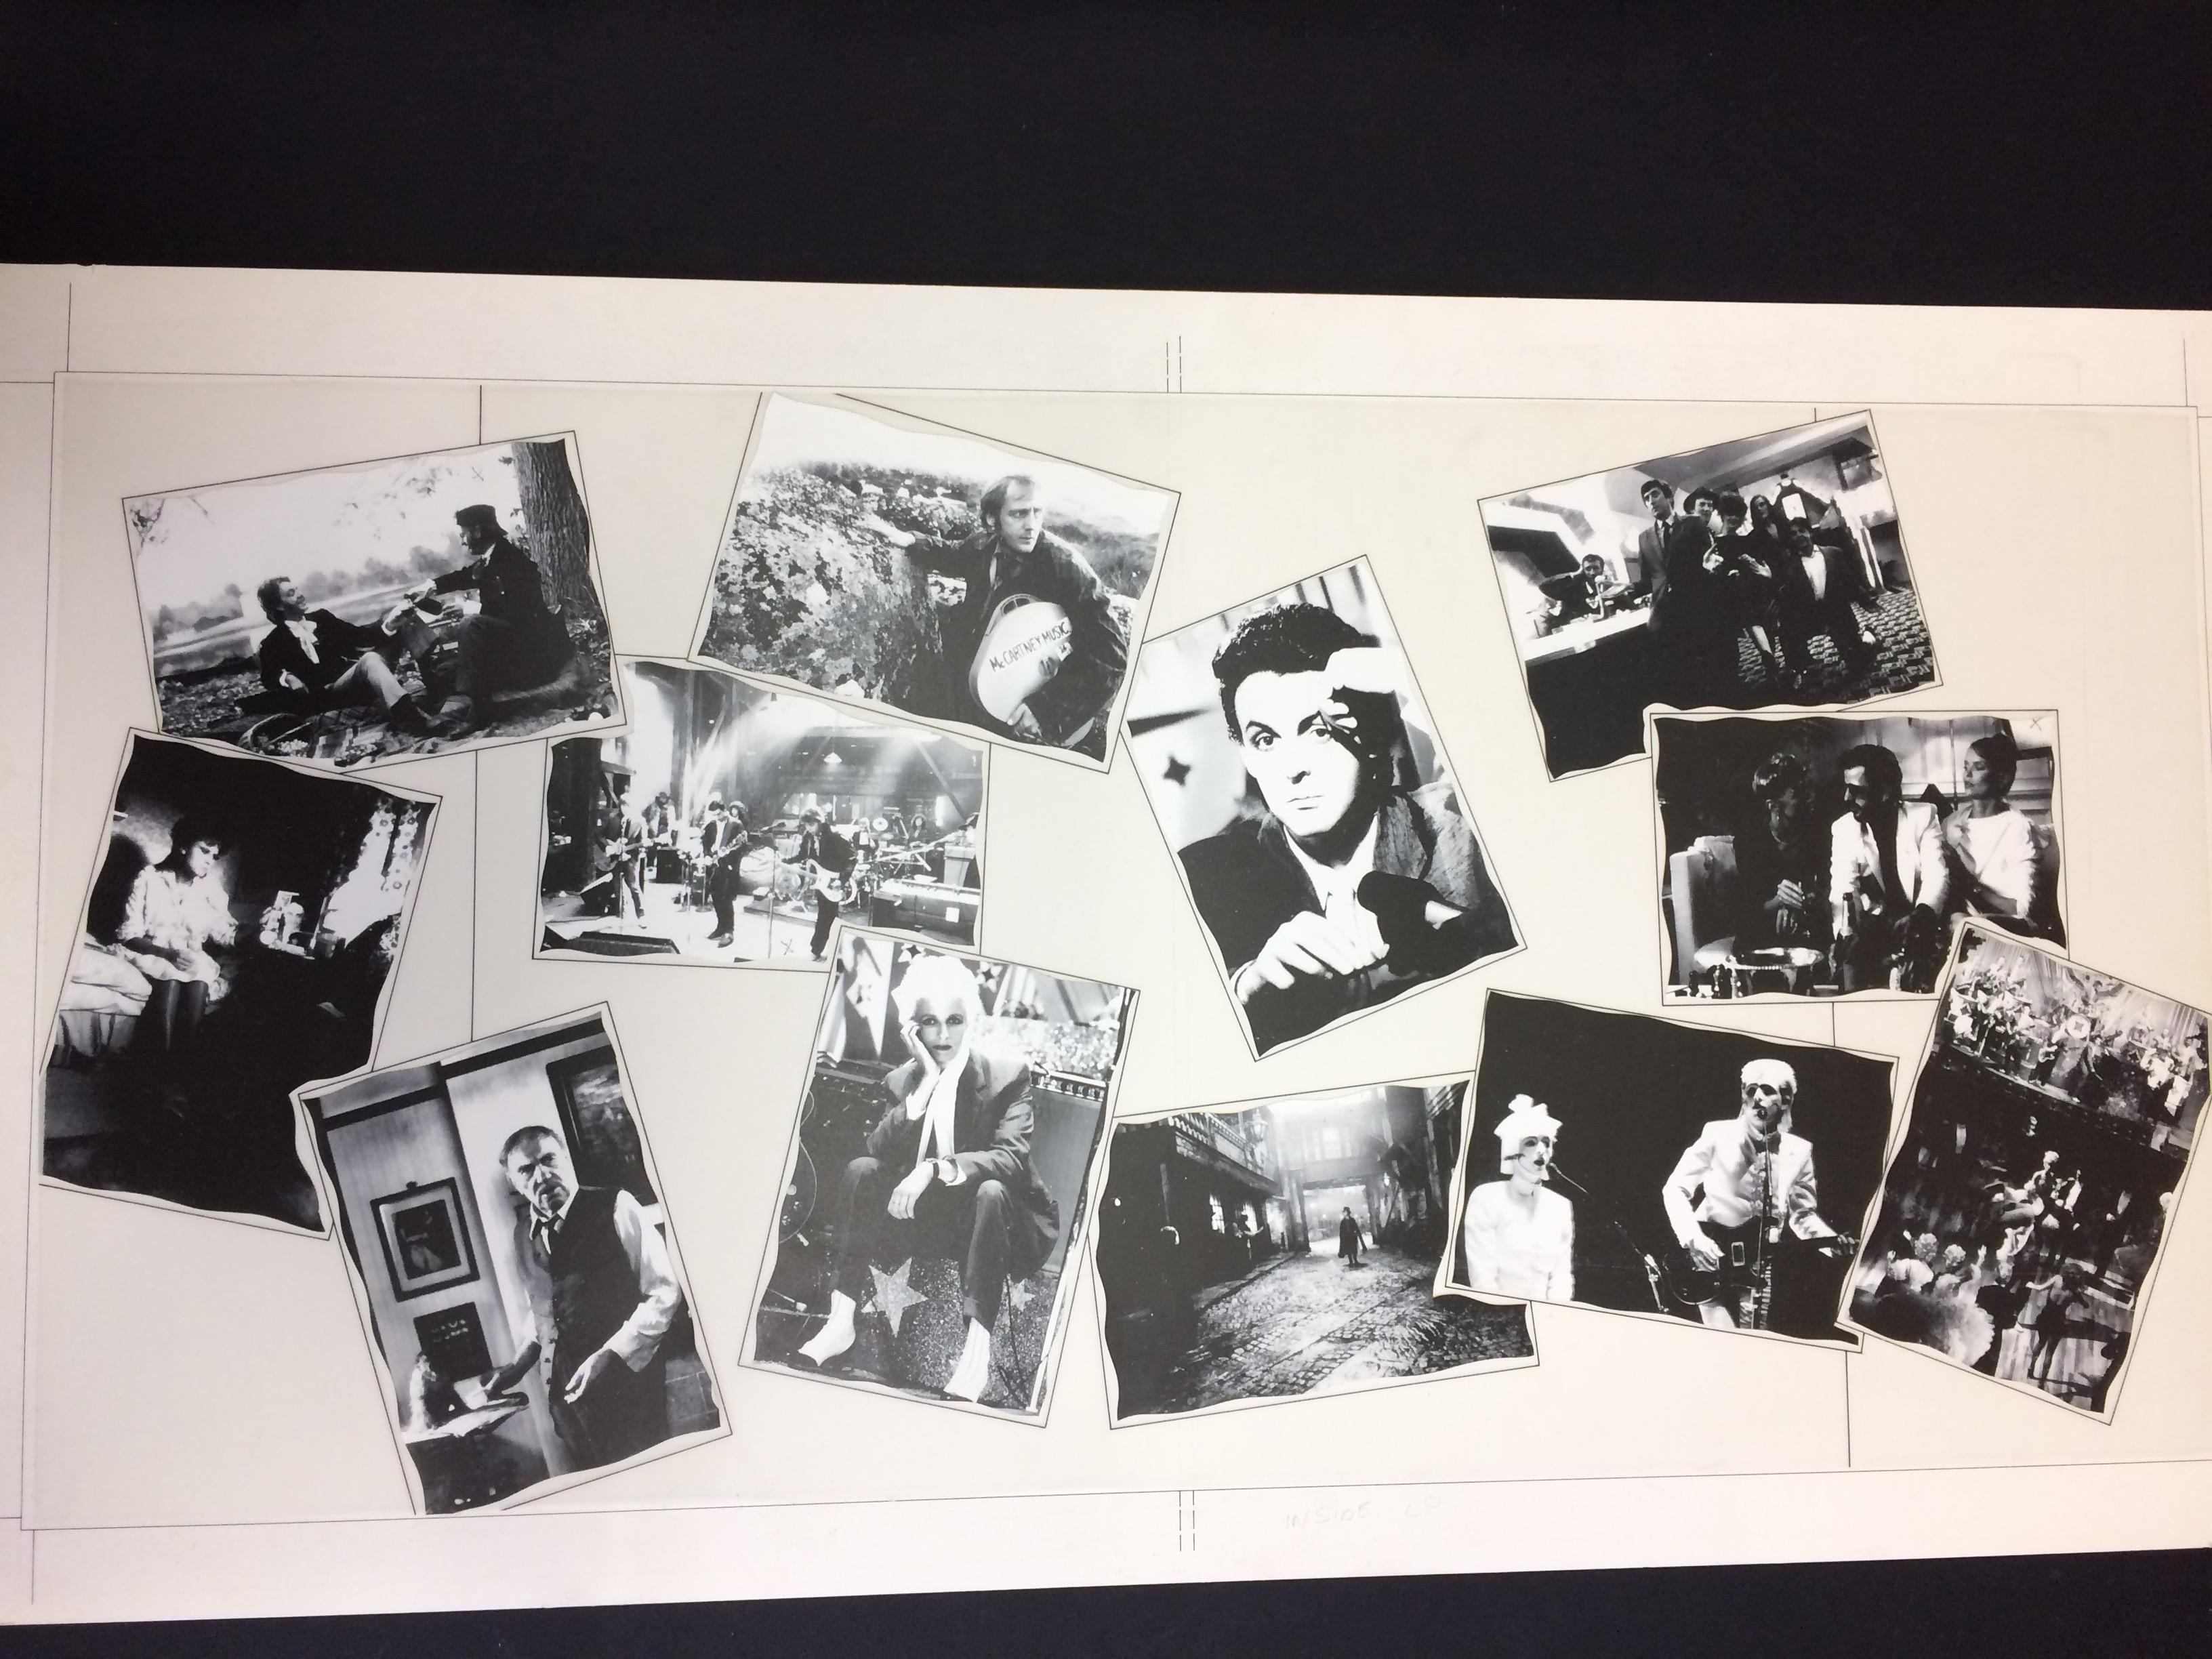 Paul McCartney original album artwork for Give my regards to broad street